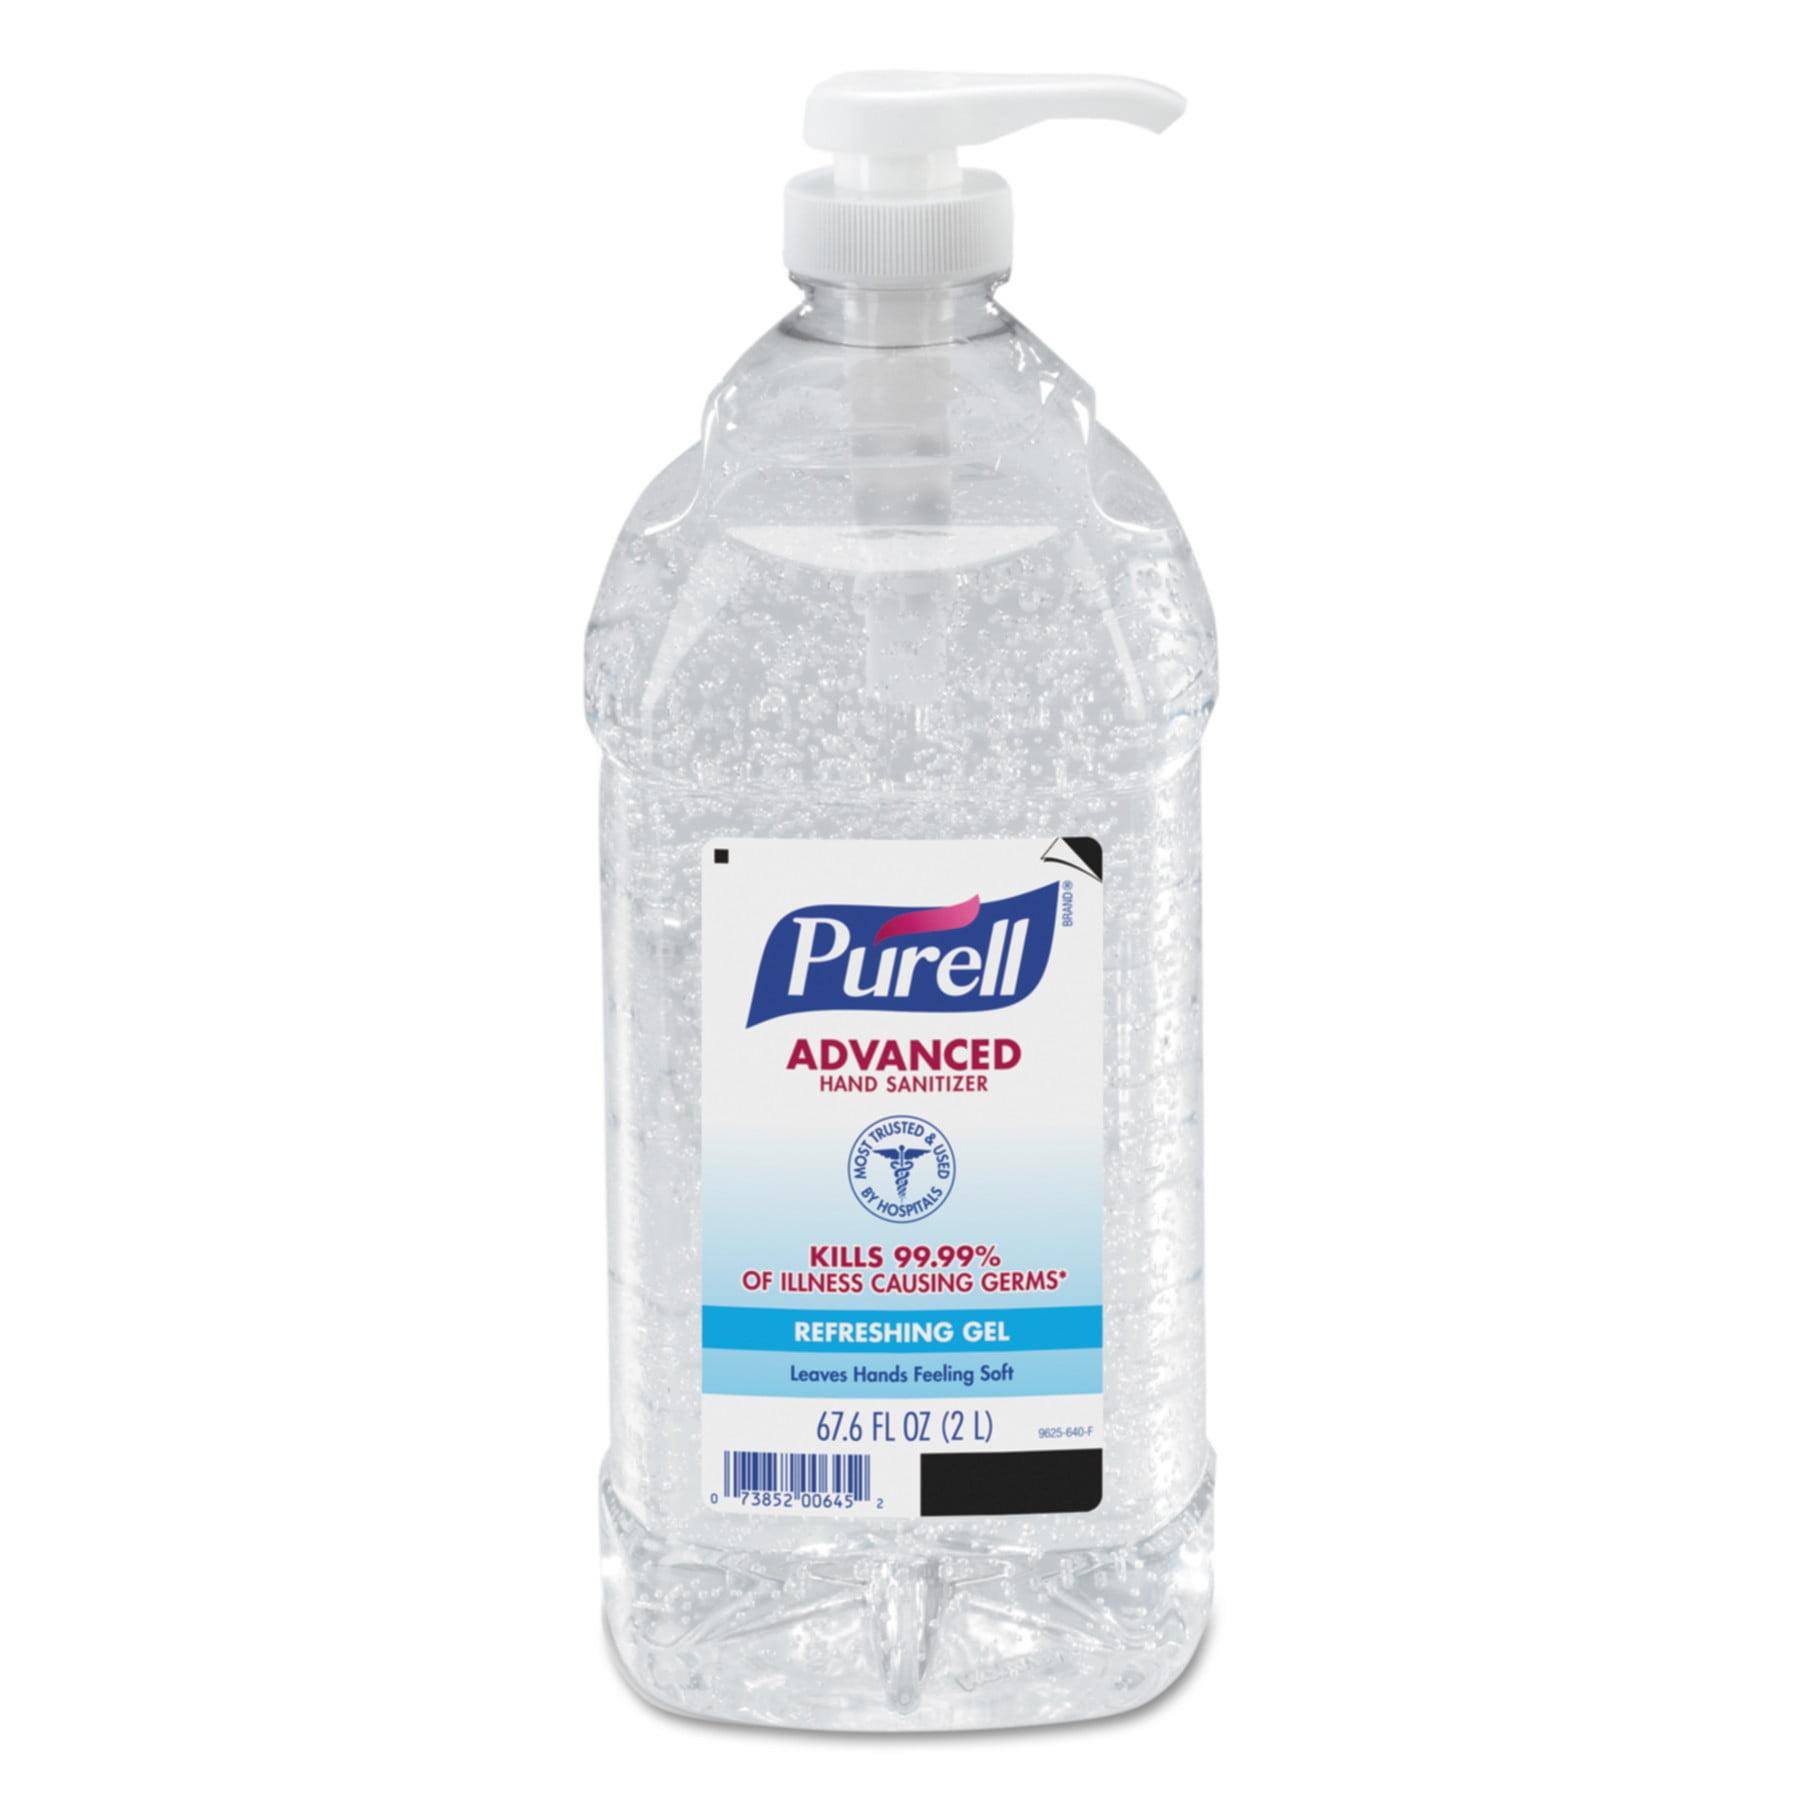 PURELL Advanced Instant Hand Sanitizer 9625-04, 2-liter Bottle